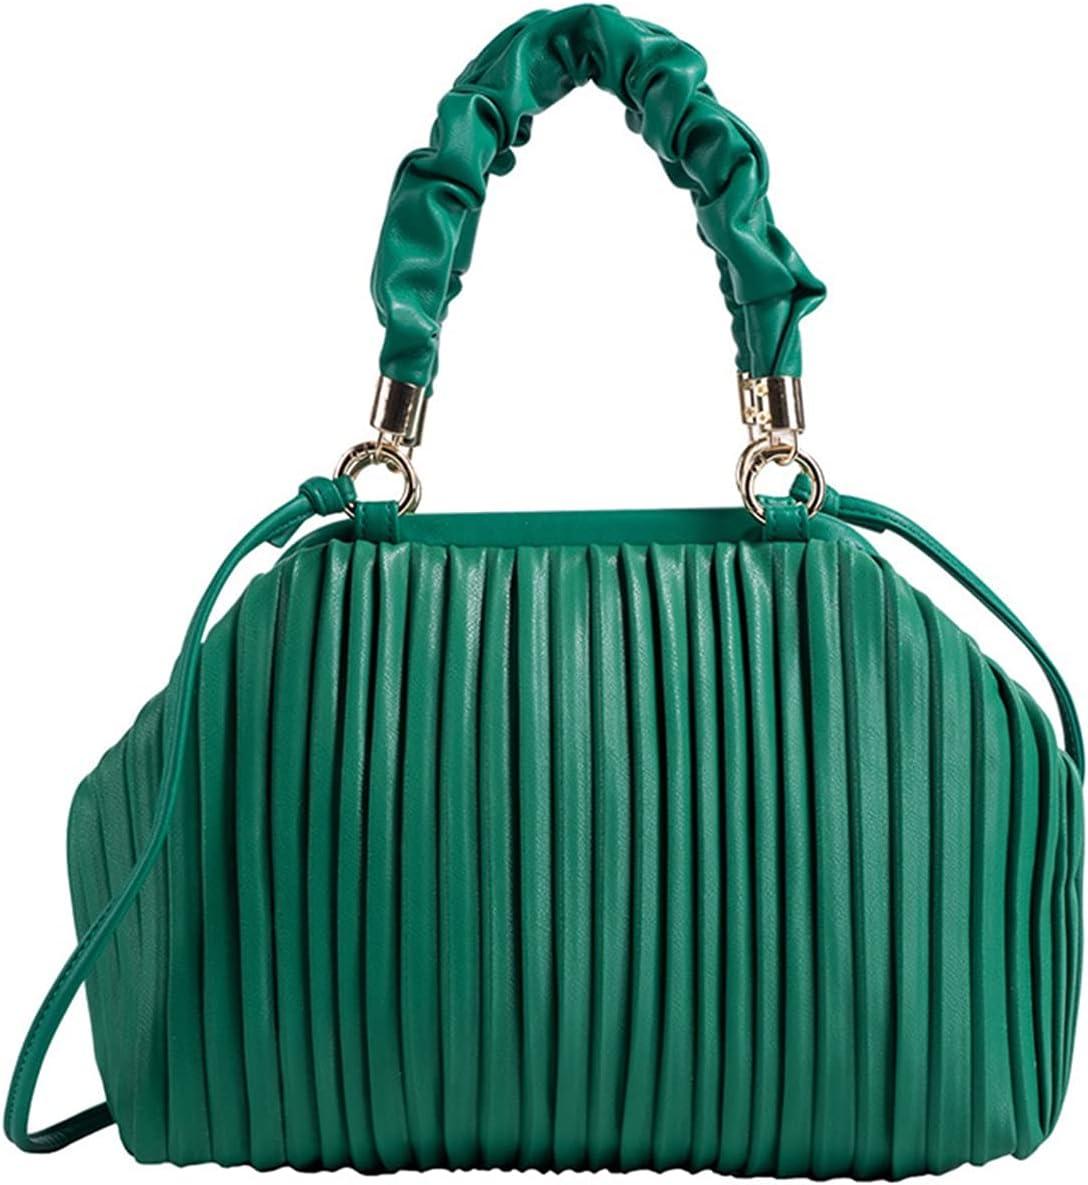 GOUHOME Women's Evening Handbags Shoulder Bag Ruched Dumpling Crossbody Bags Large Capacity Cloud Clutch Purses (Color : Green, Size : 32x22x9cm)